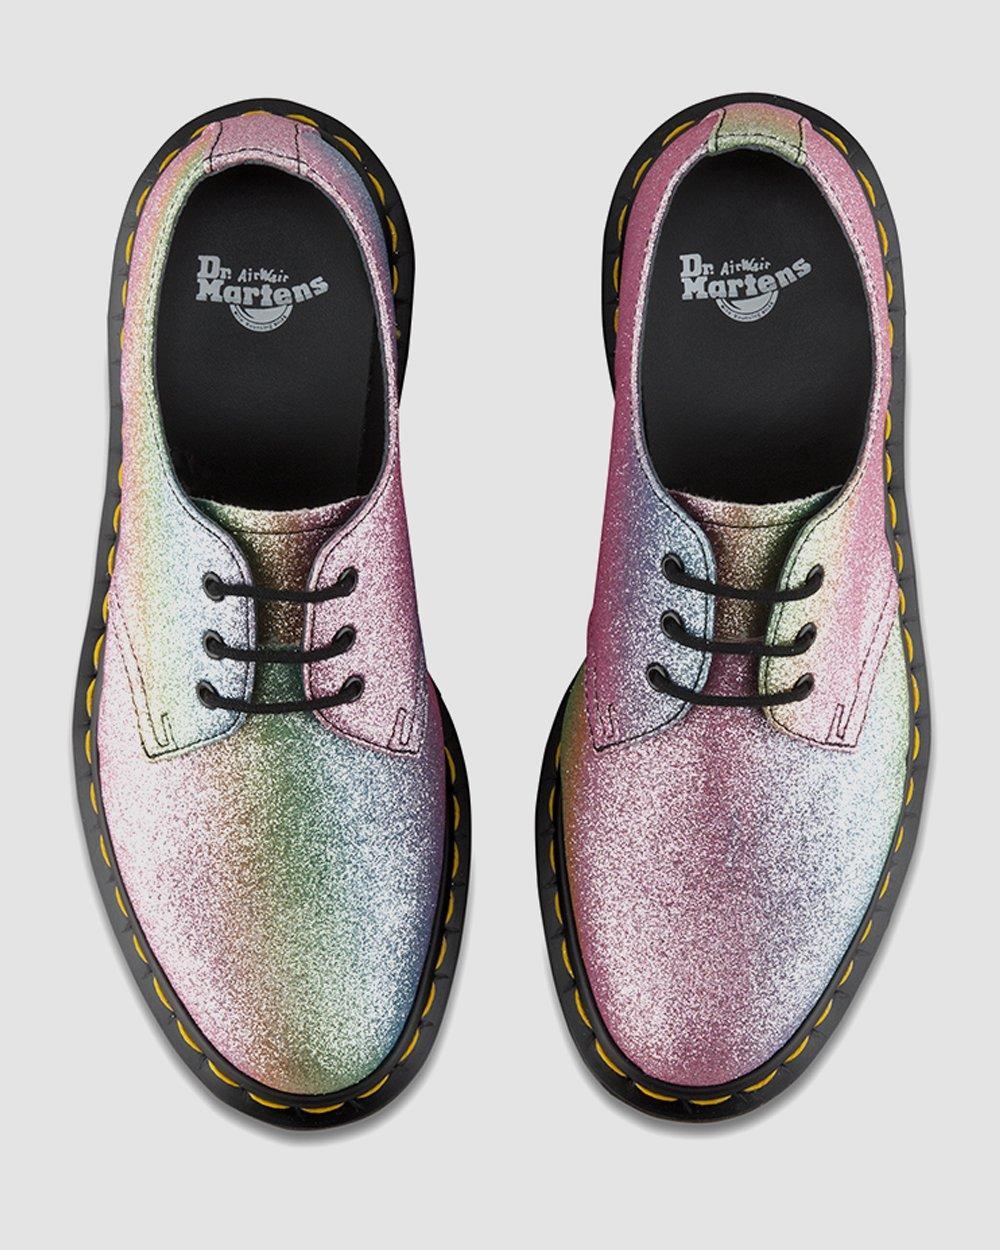 1461 Rainbow Glitter   Dr. Martens